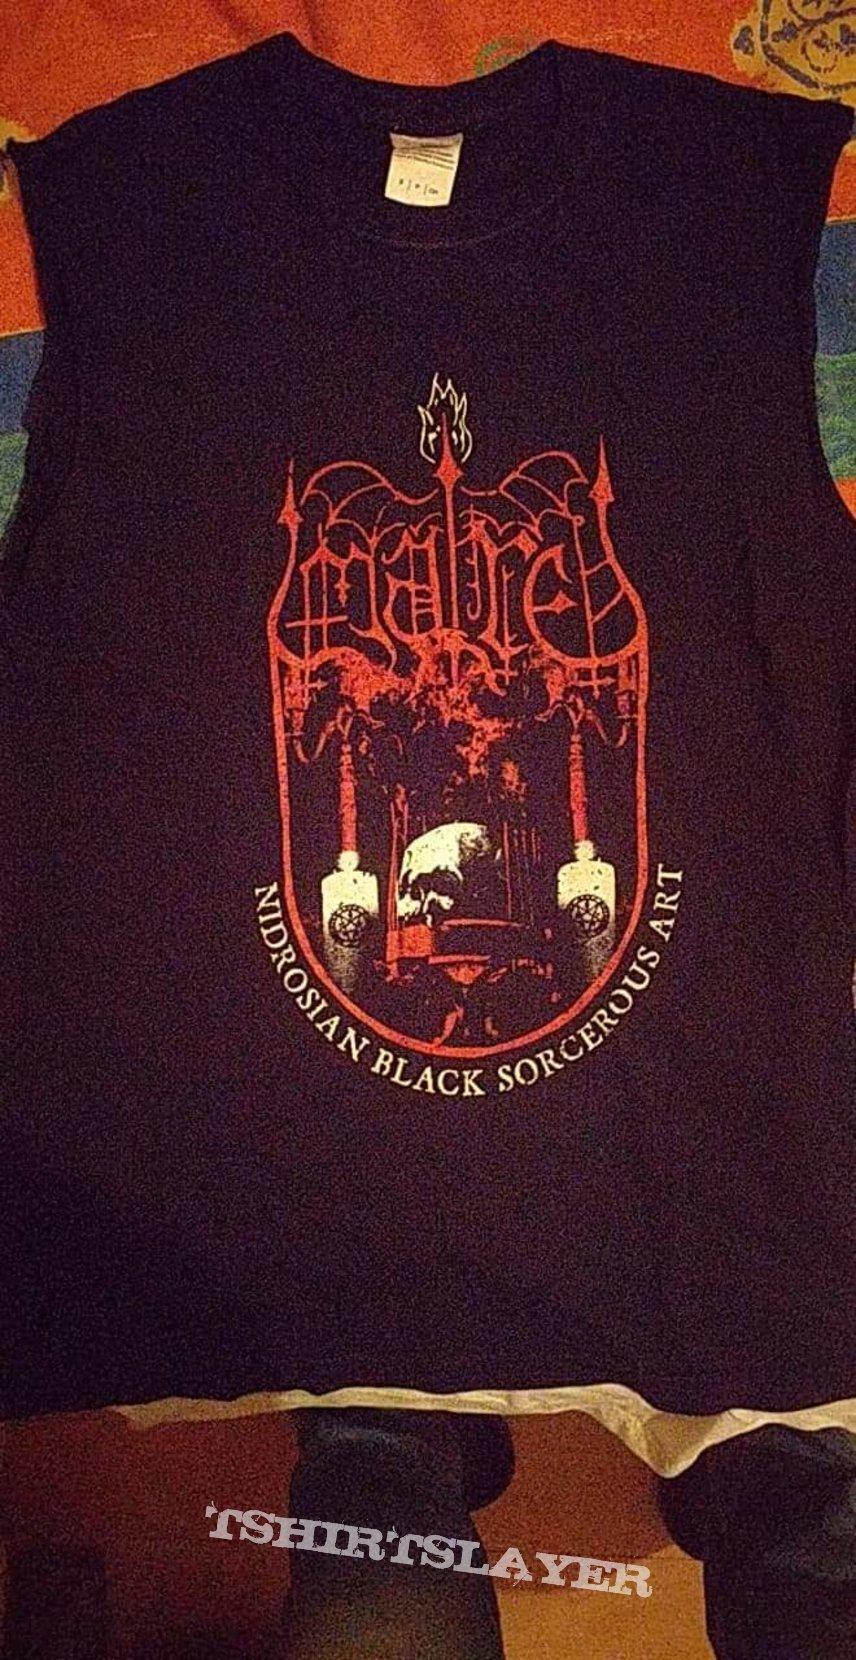 Mare-Nidrosian Black Sorcerous Art shirt